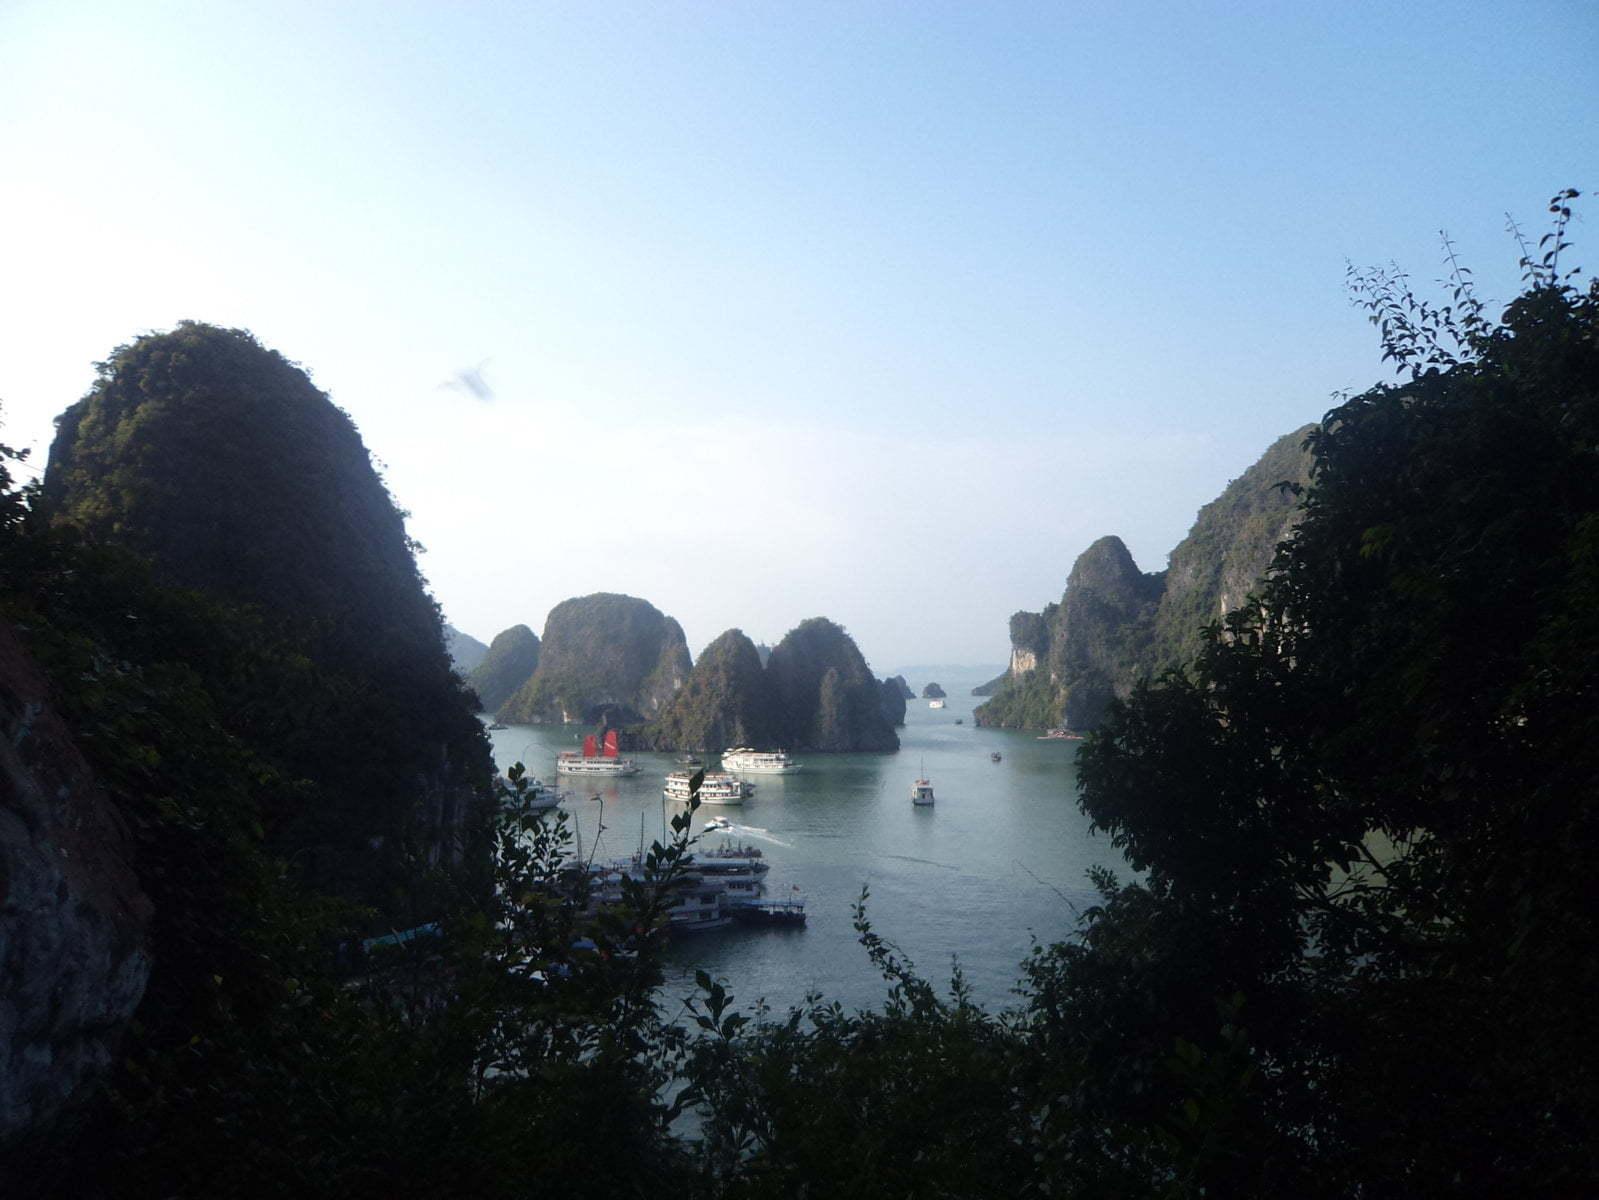 Vista 2 da Luan Cave - Ha Long Bay, próximo a Hanoi, Vietnã